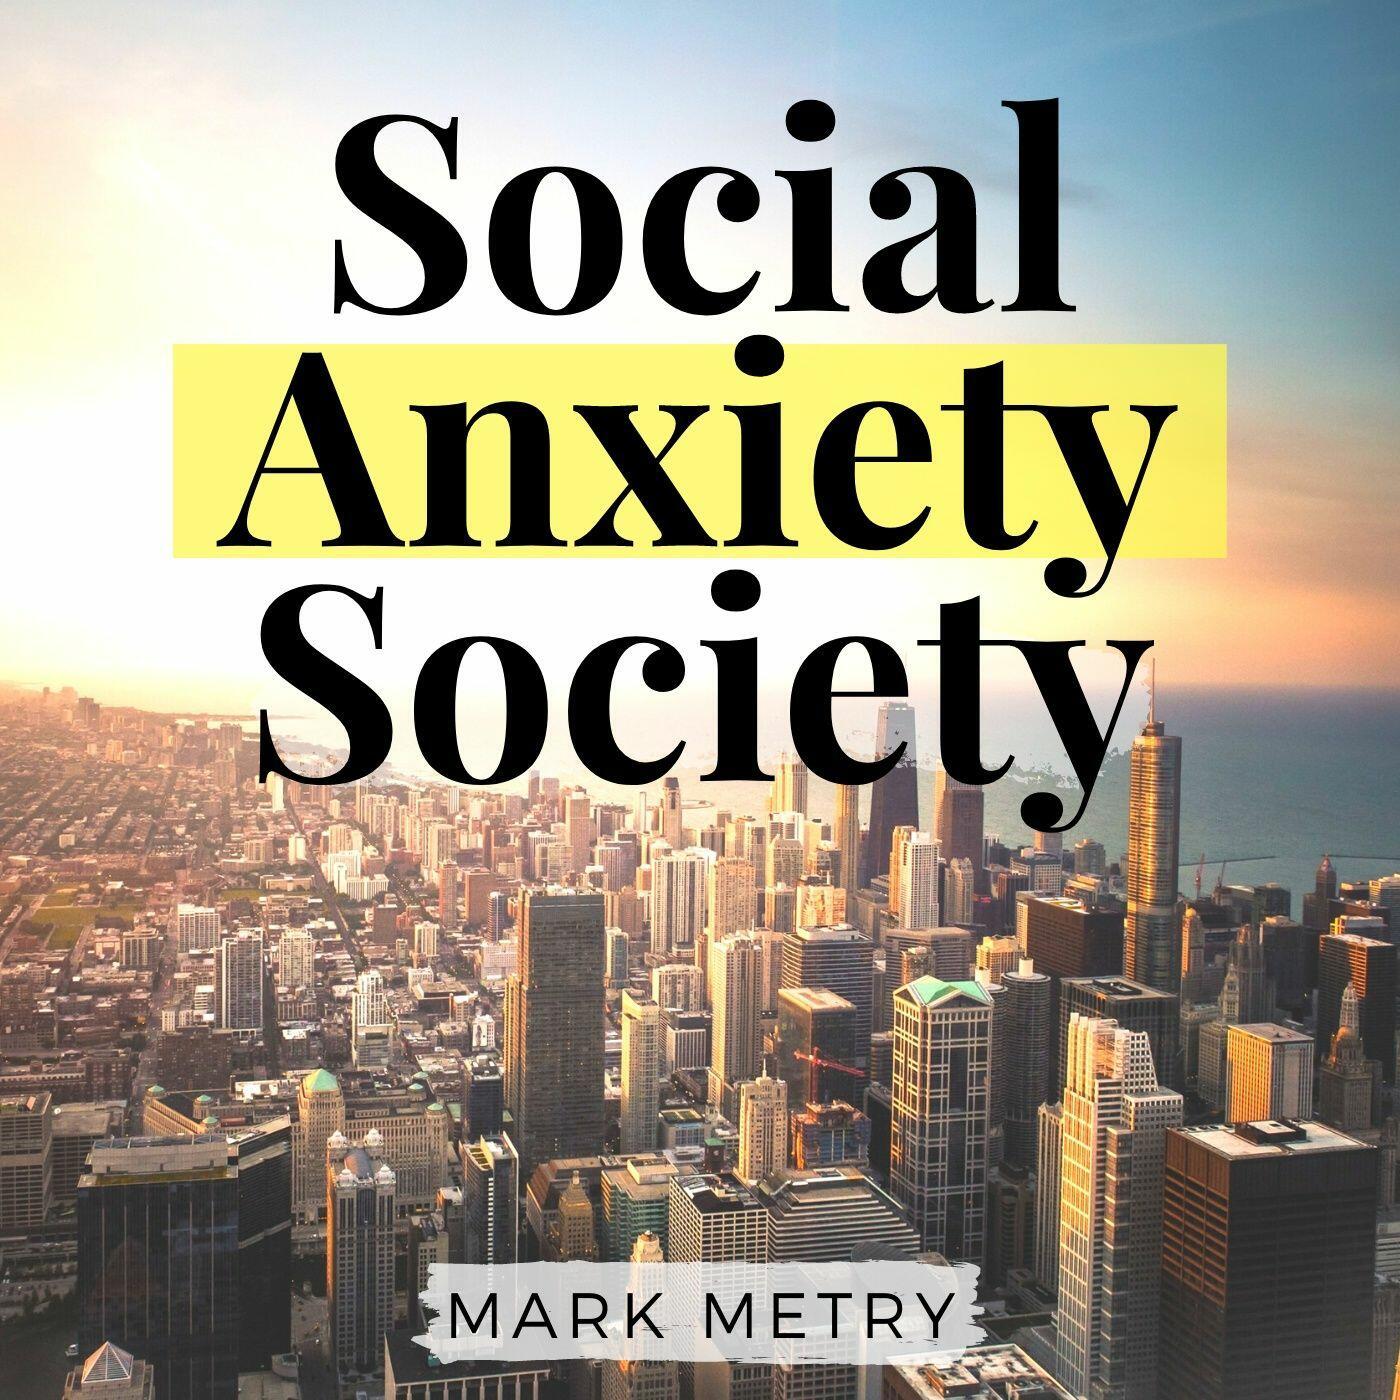 Social Anxiety Society